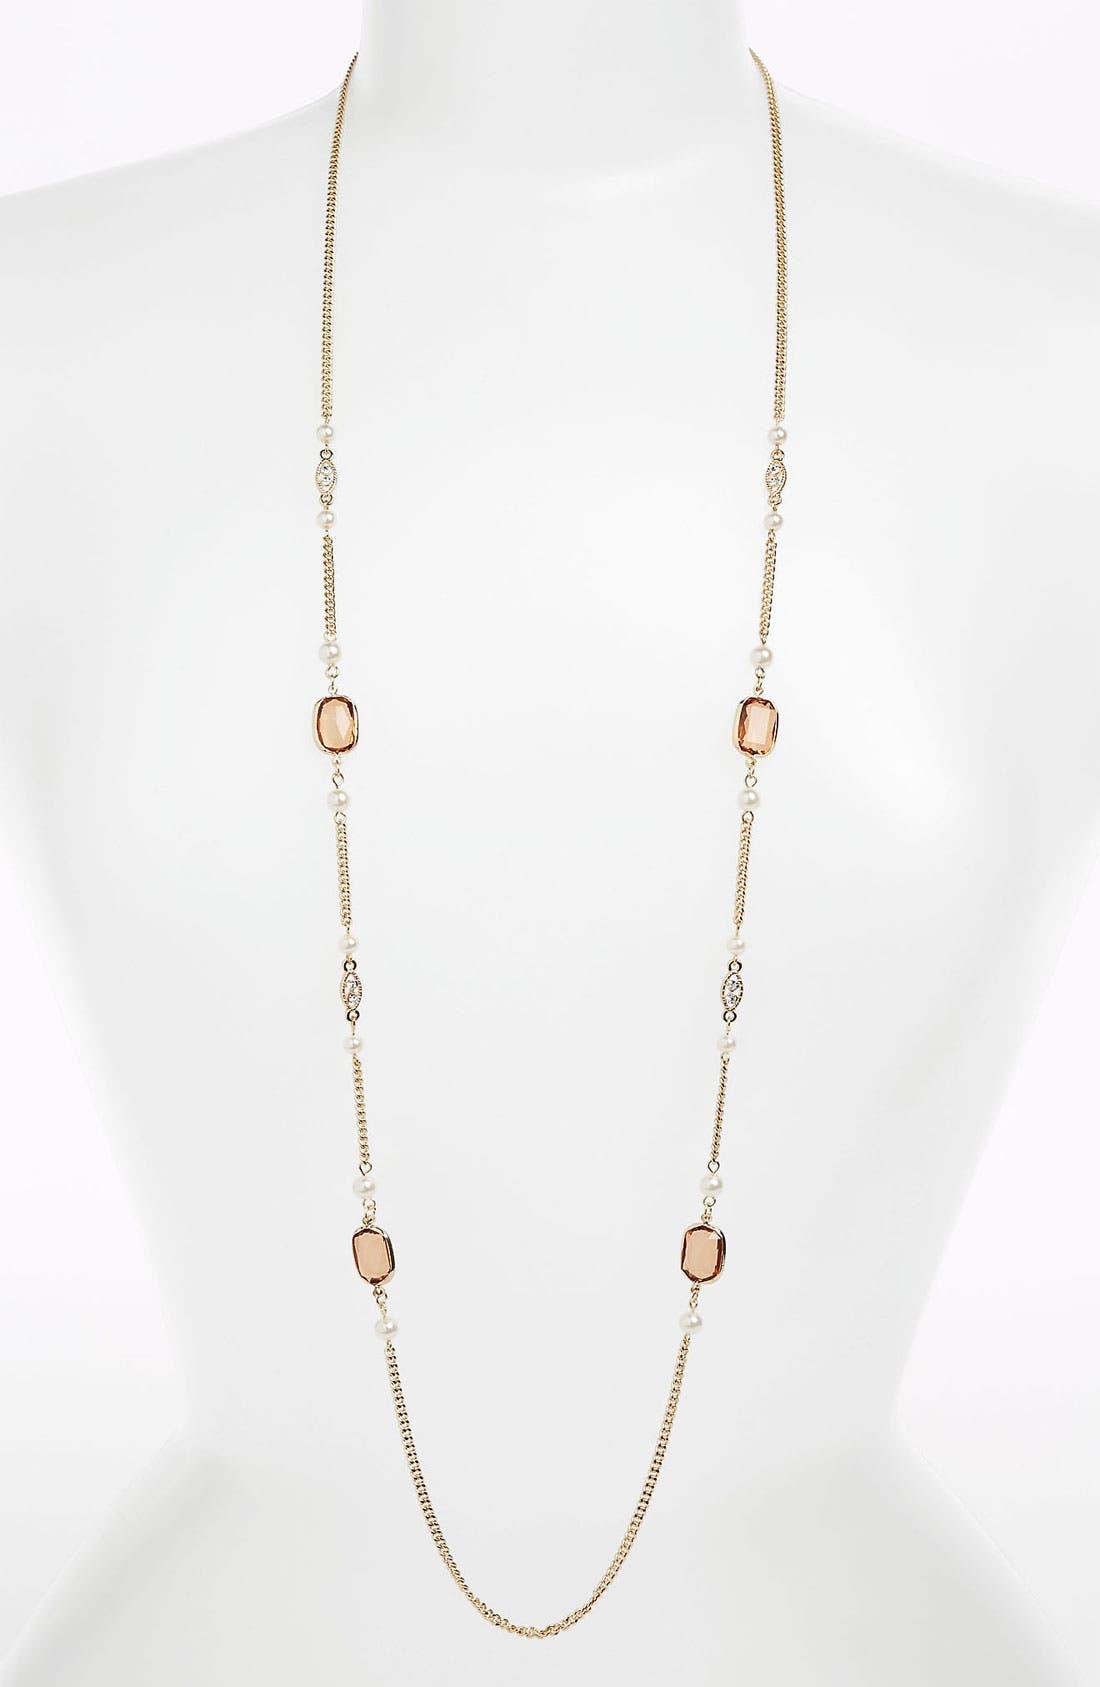 Main Image - Stephan & Co. Delicate Vintage Necklace